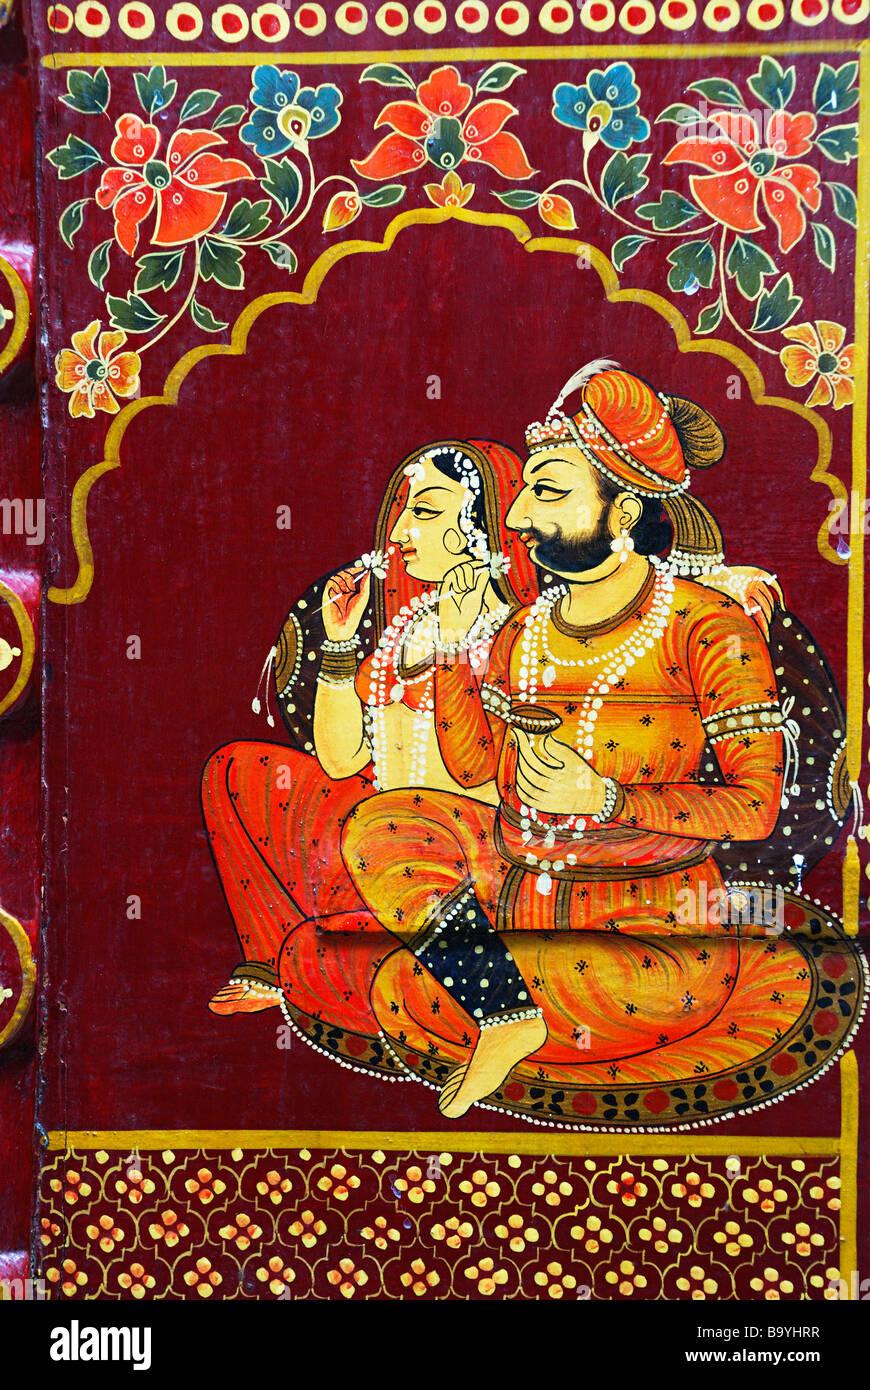 Rajasthani Painting on Window, Rajasthan State, India. - Stock Image